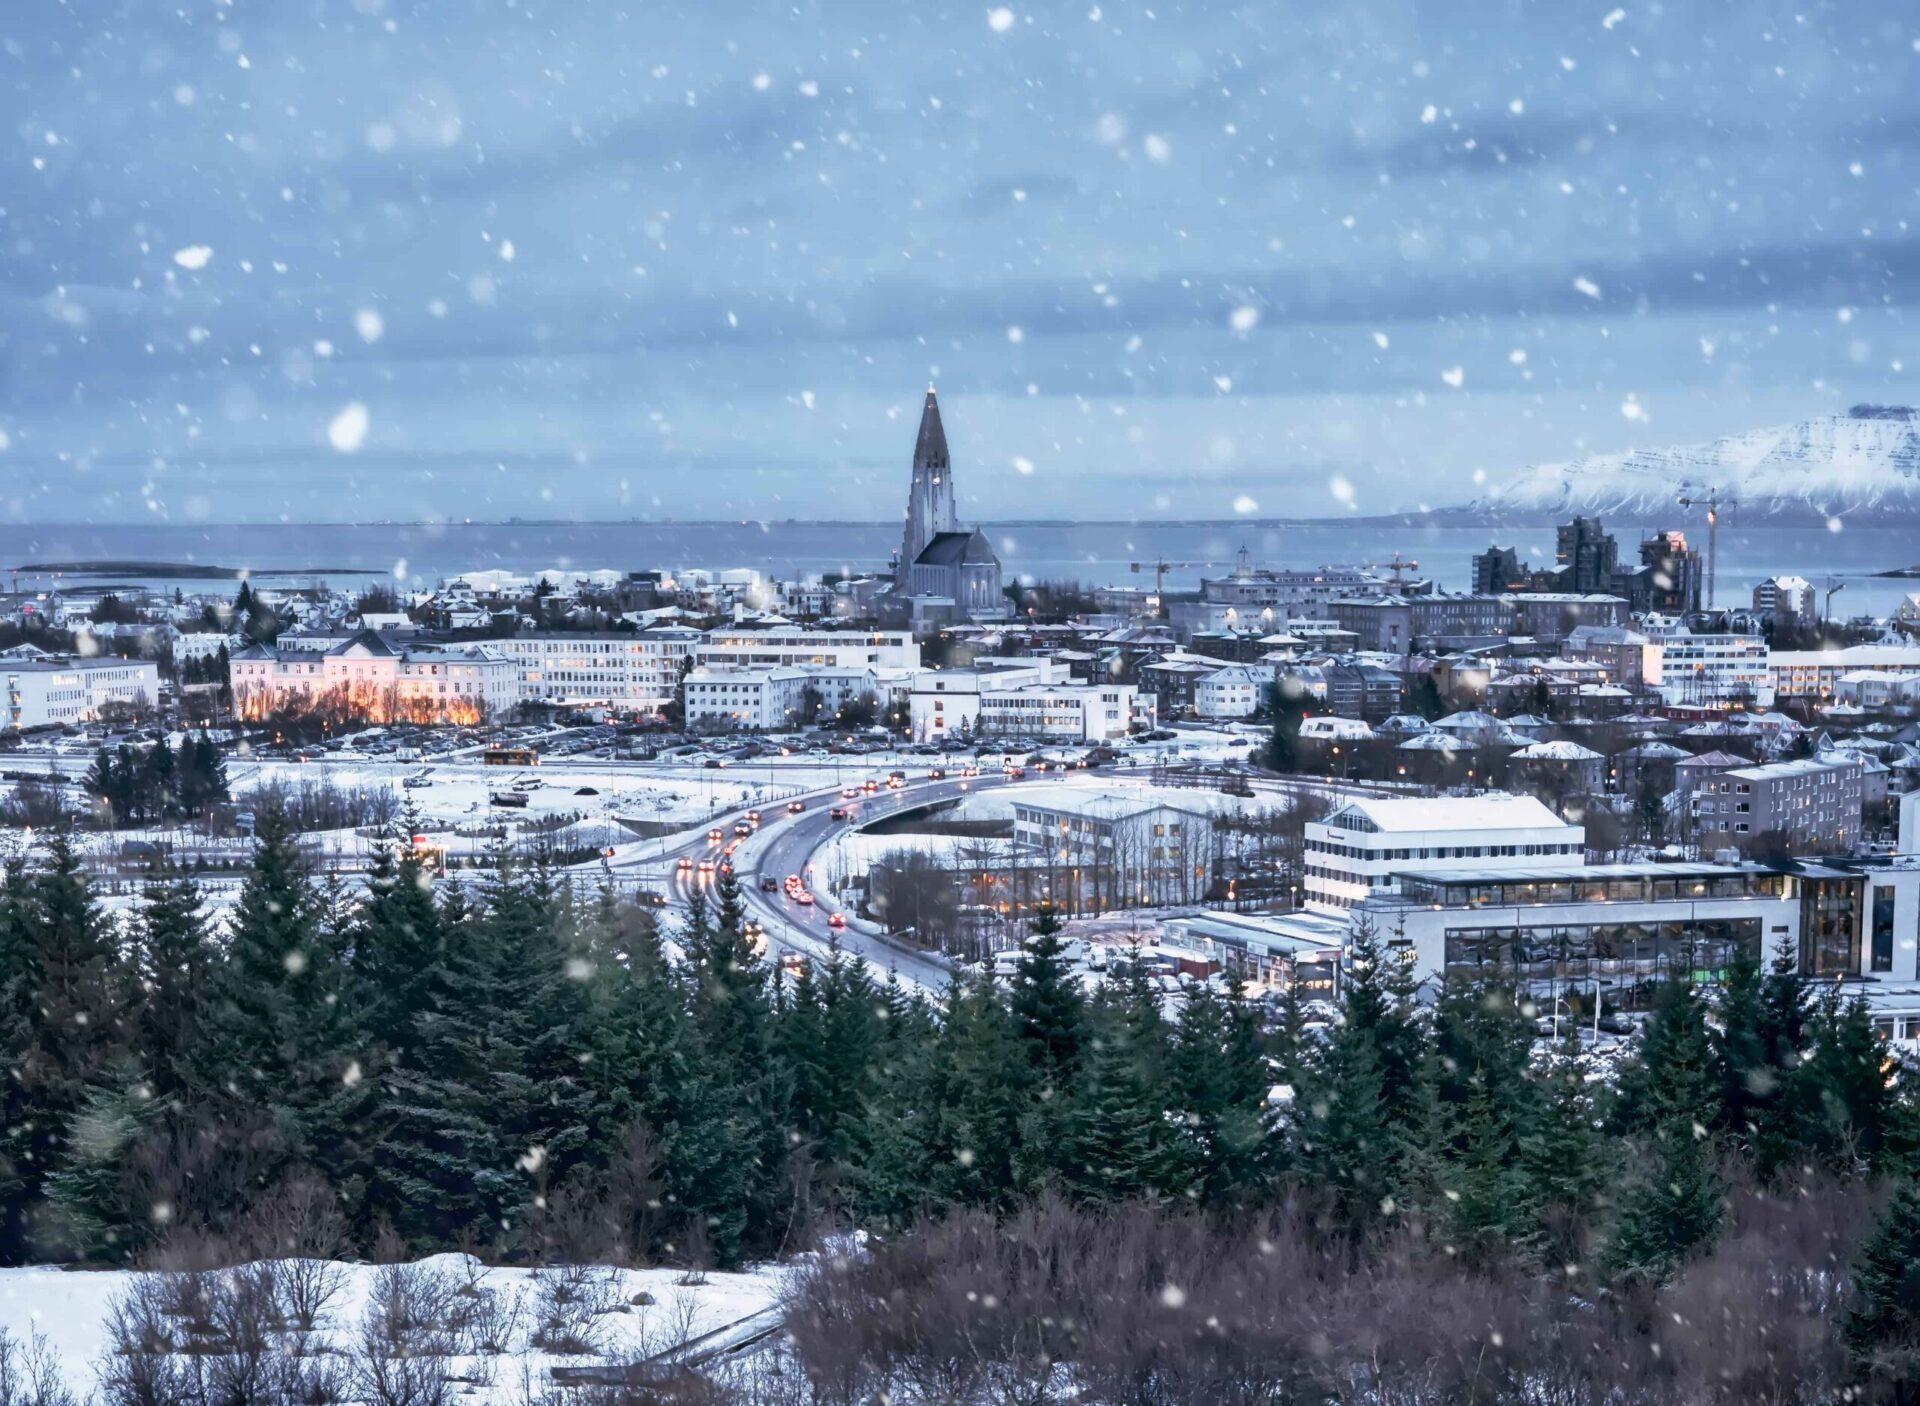 Winter in Reykjavik seen over Hallgrimskirkja church